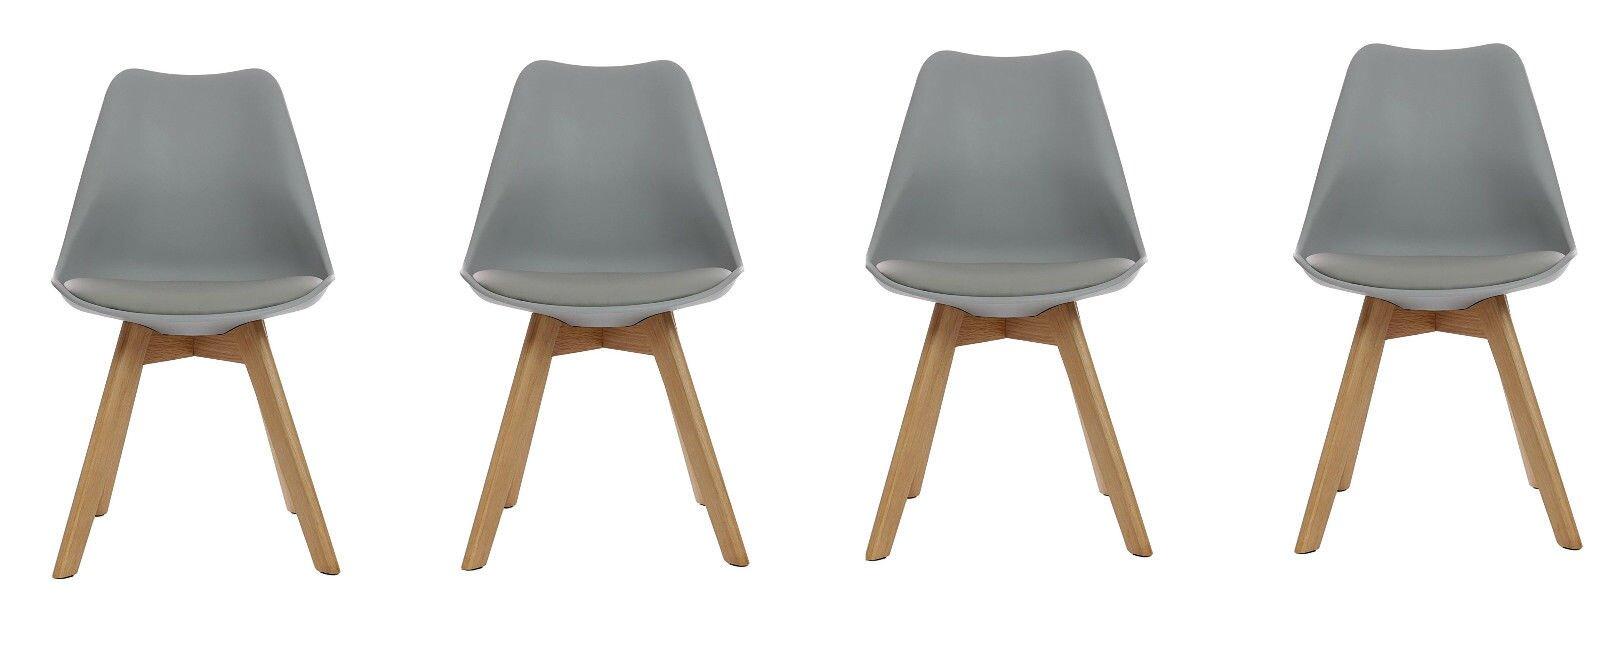 metro lane wodan upholstered dining chair  reviews  wayfaircouk - defaultname